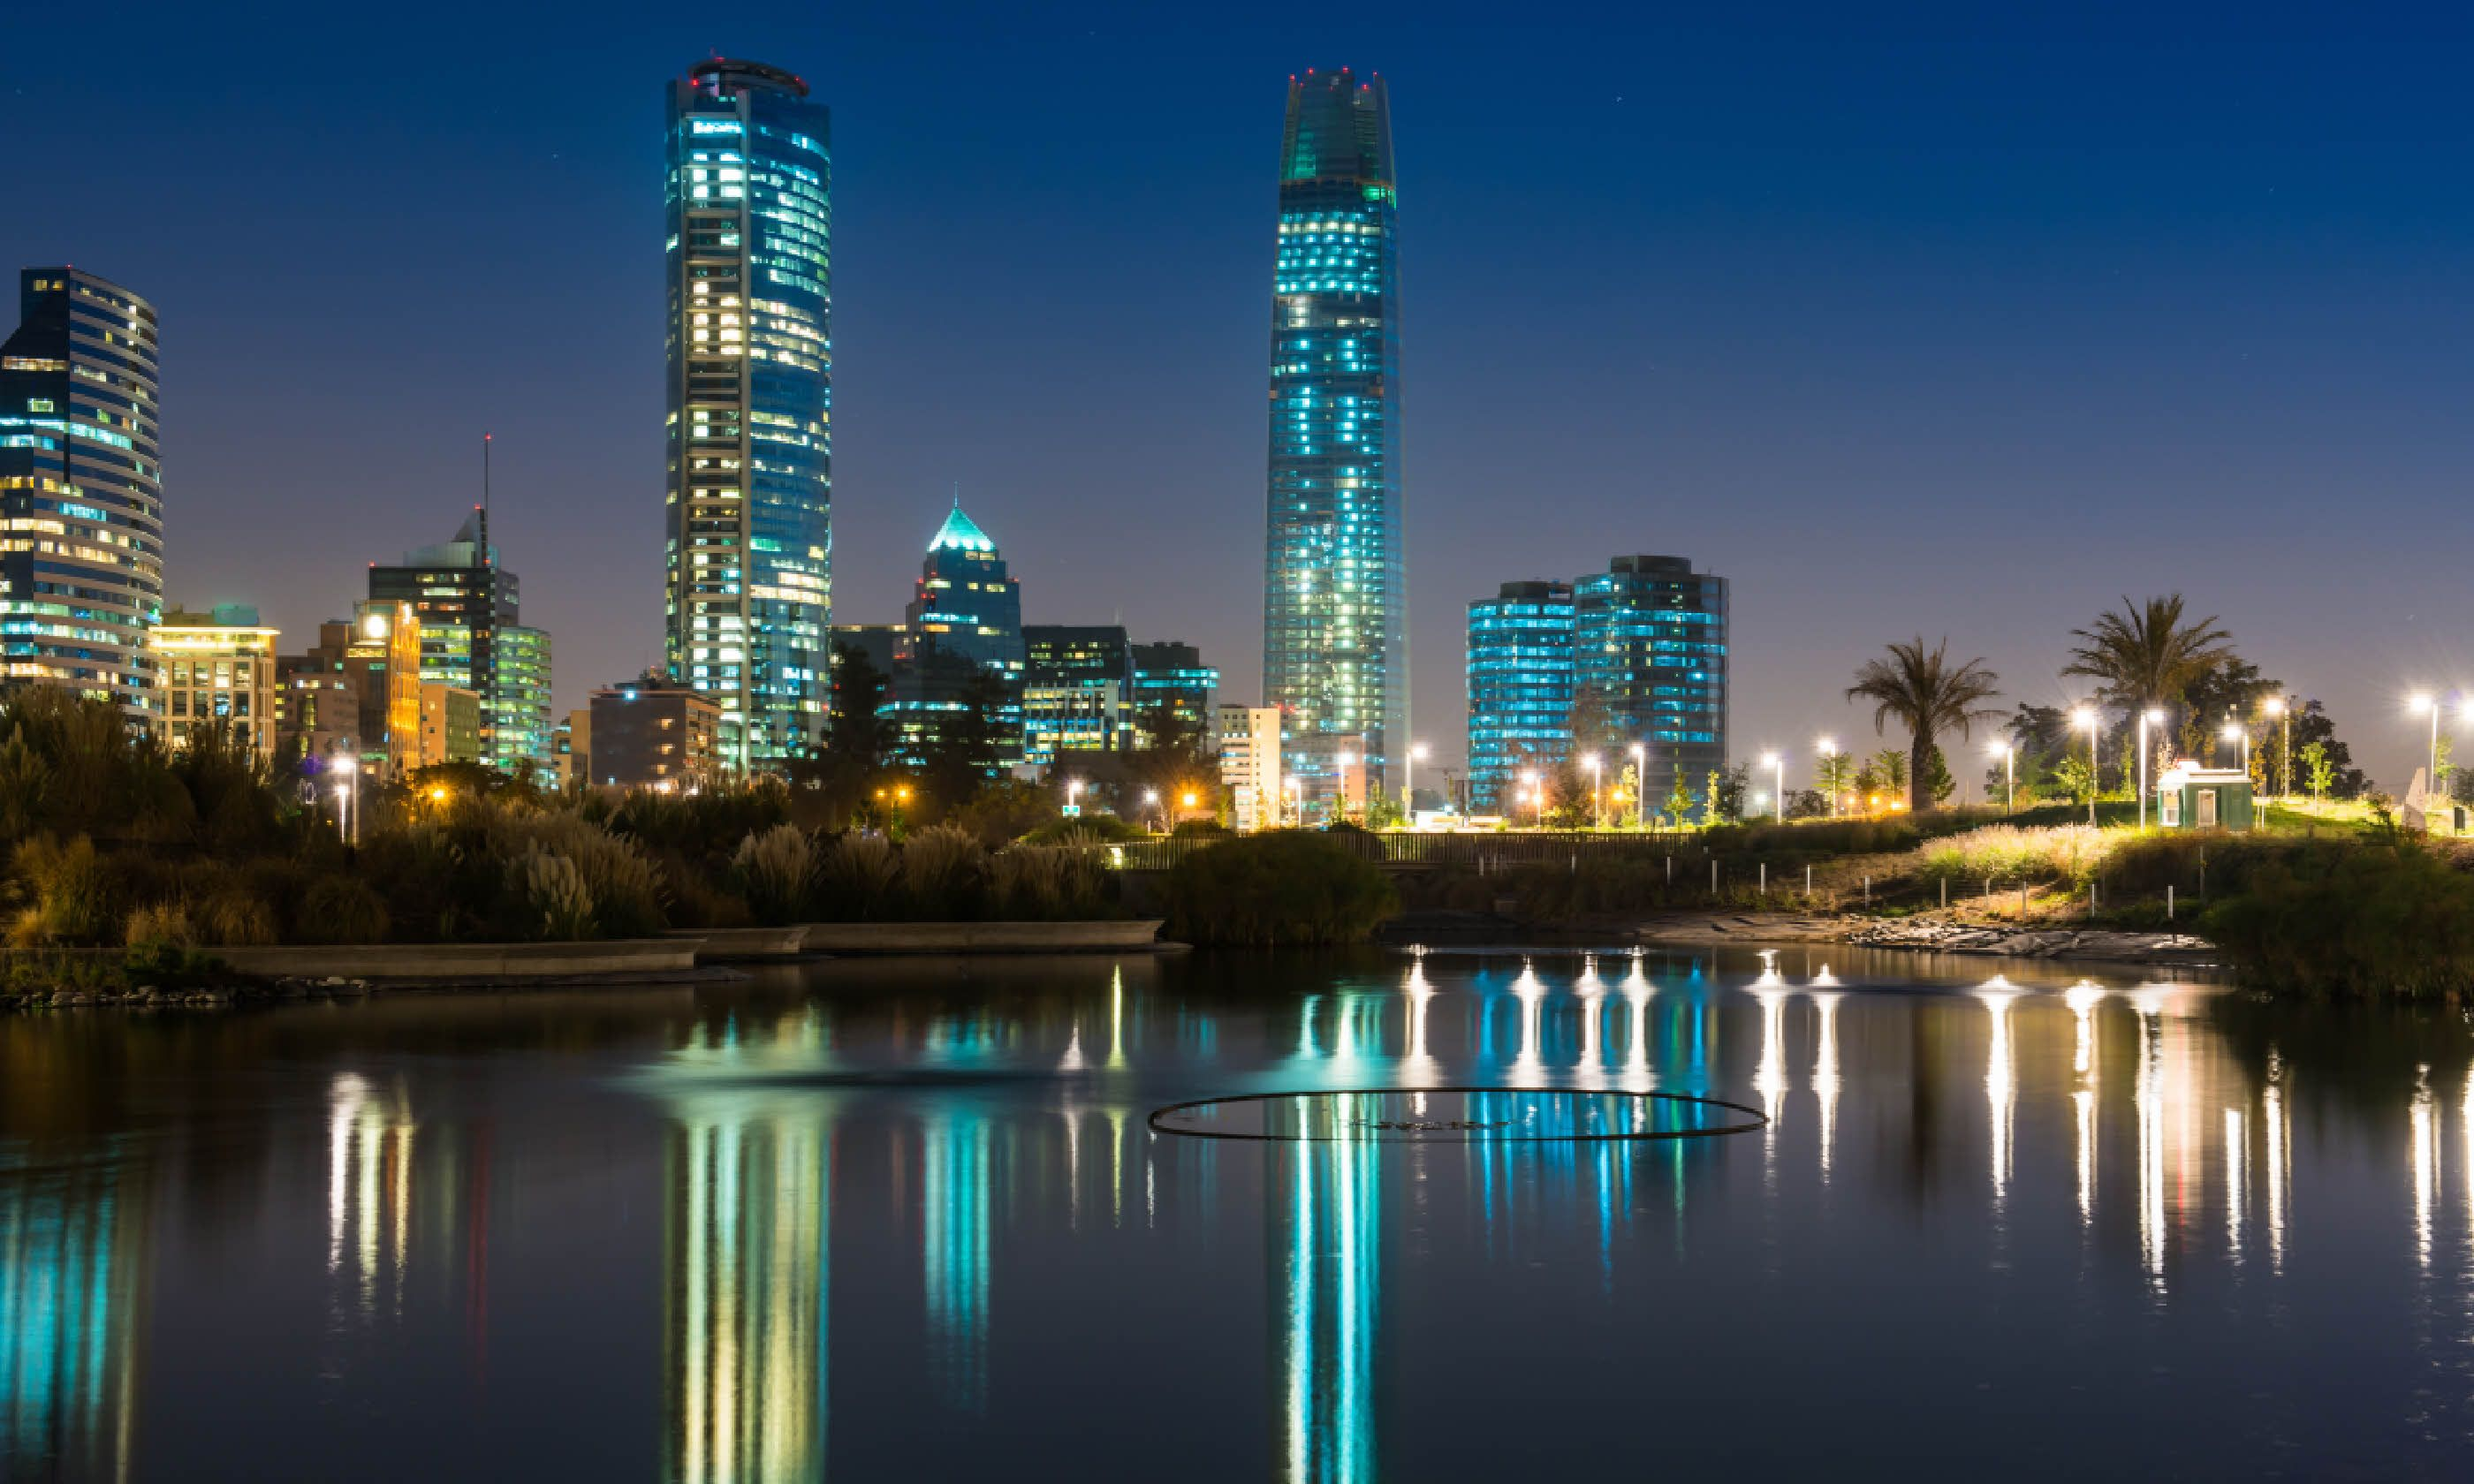 Santiago de Chile (Shutterstock)